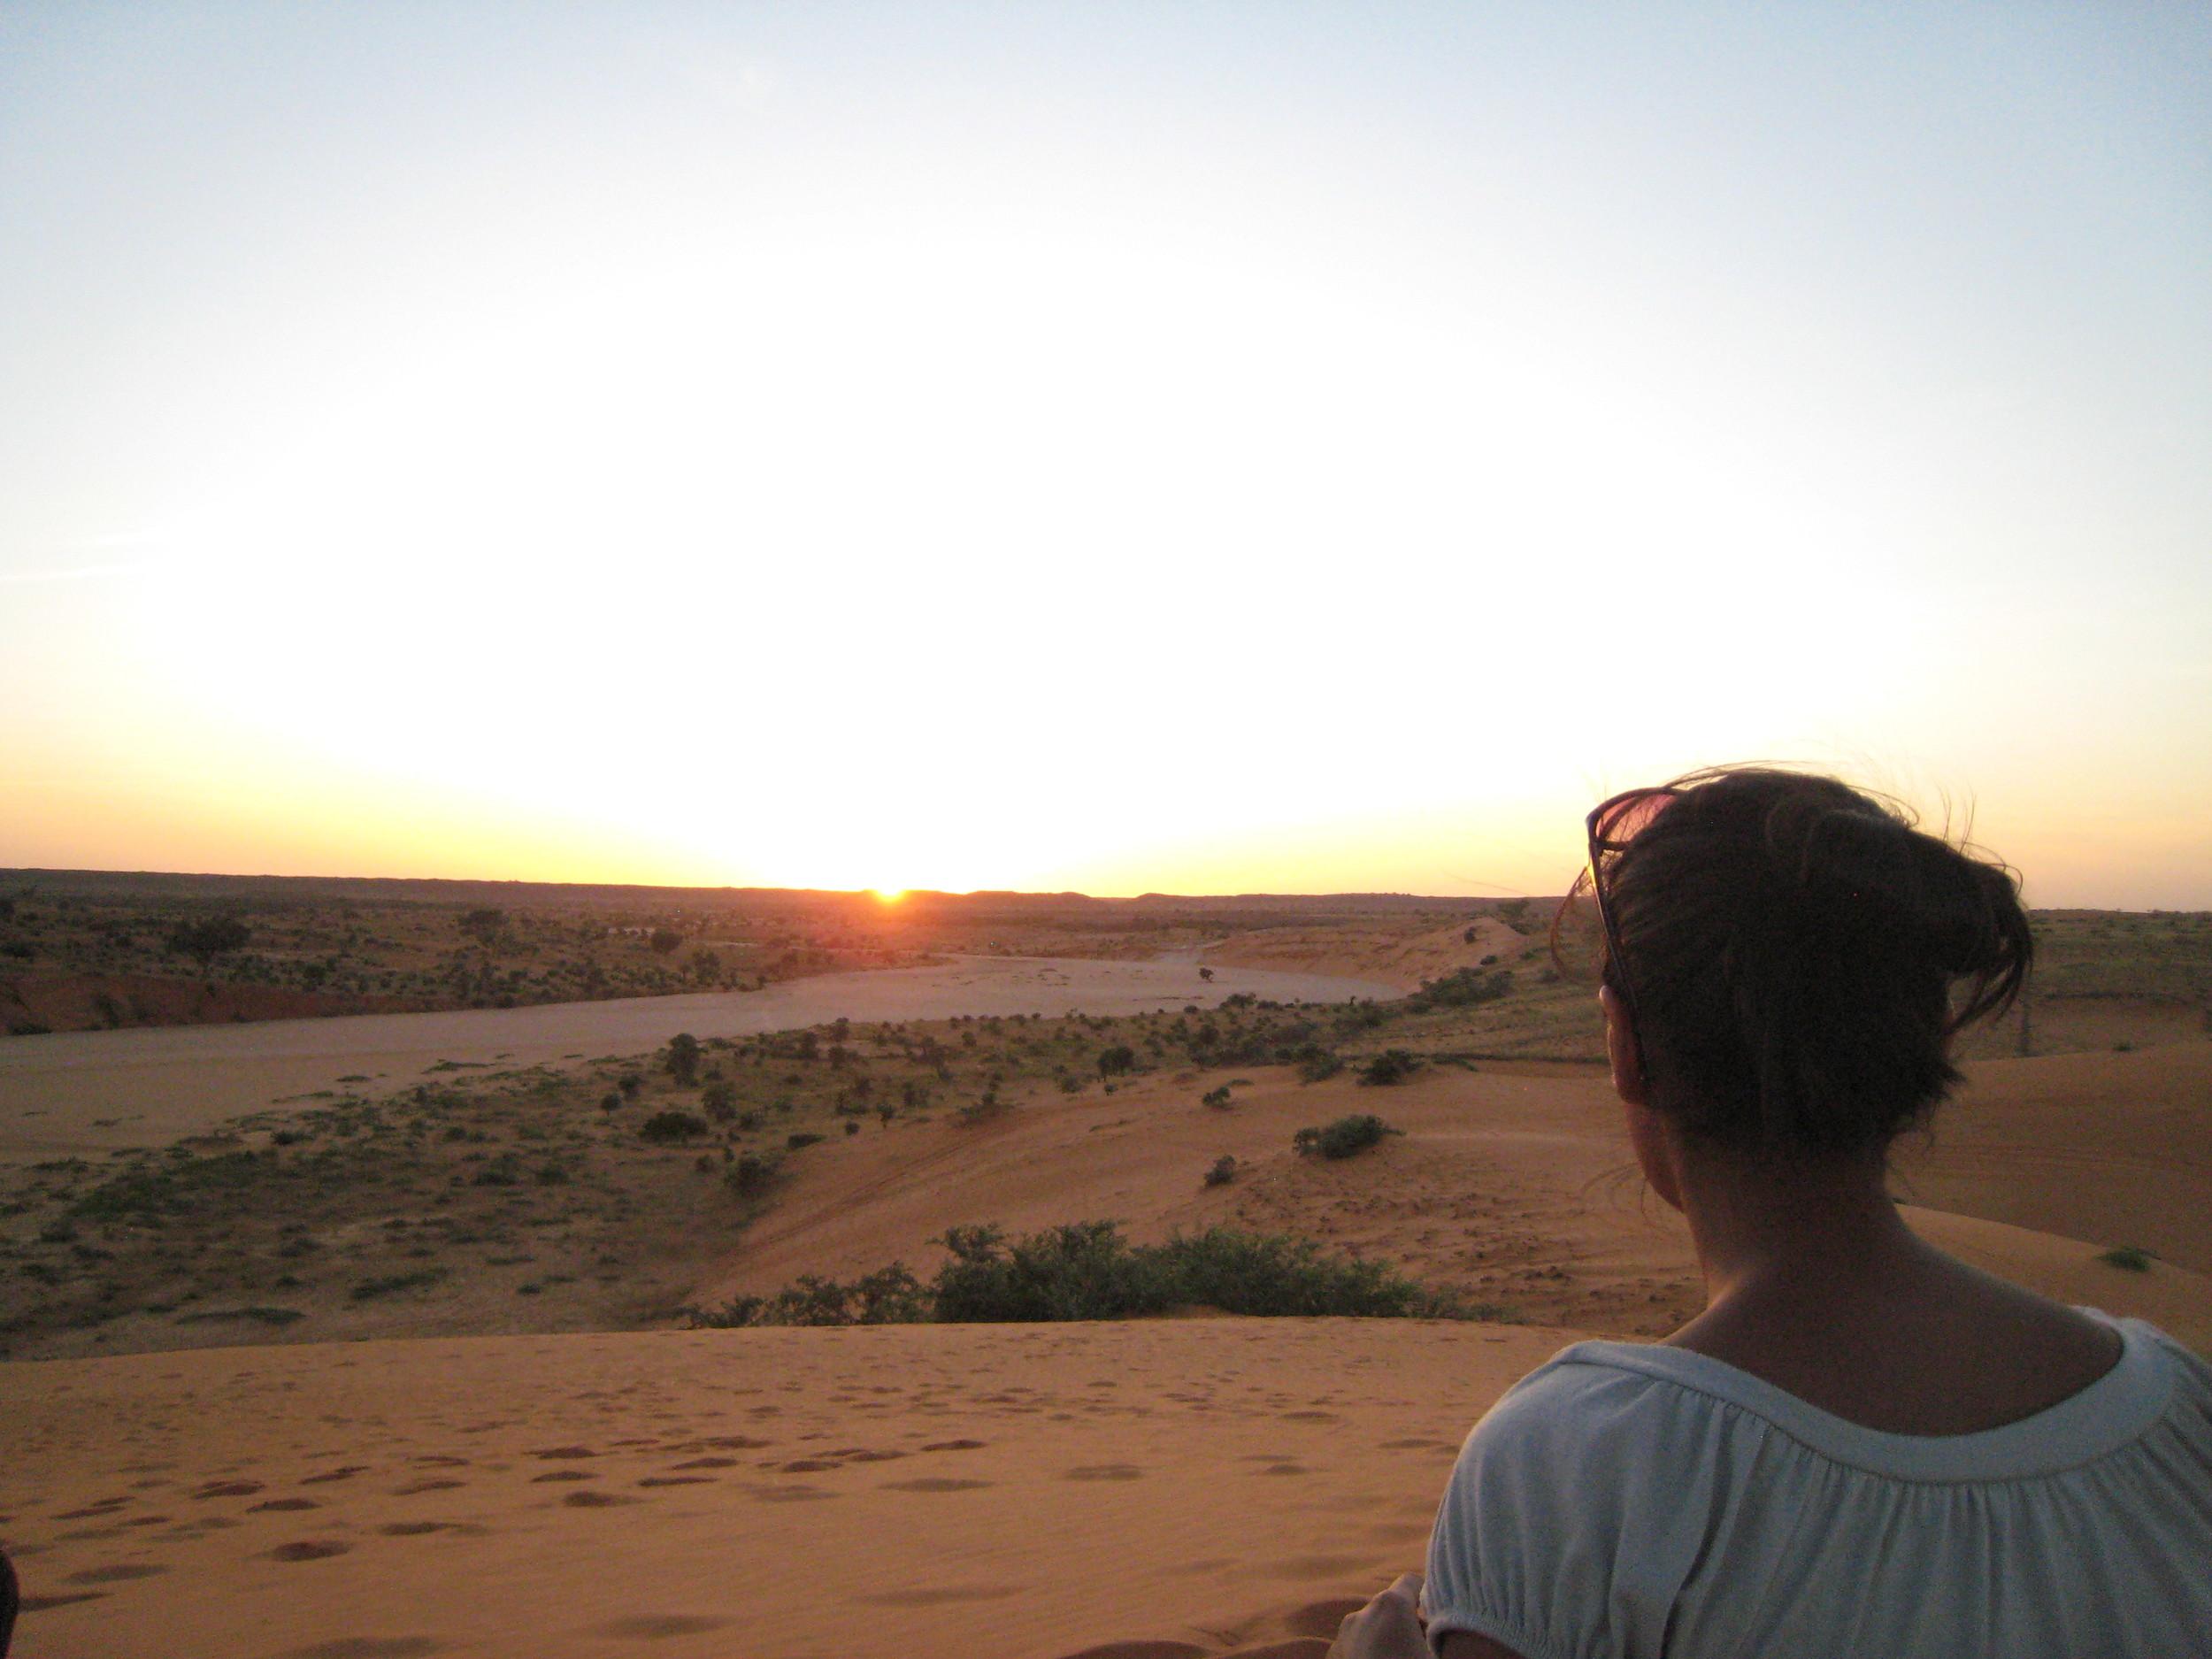 West of Niamey, Niger